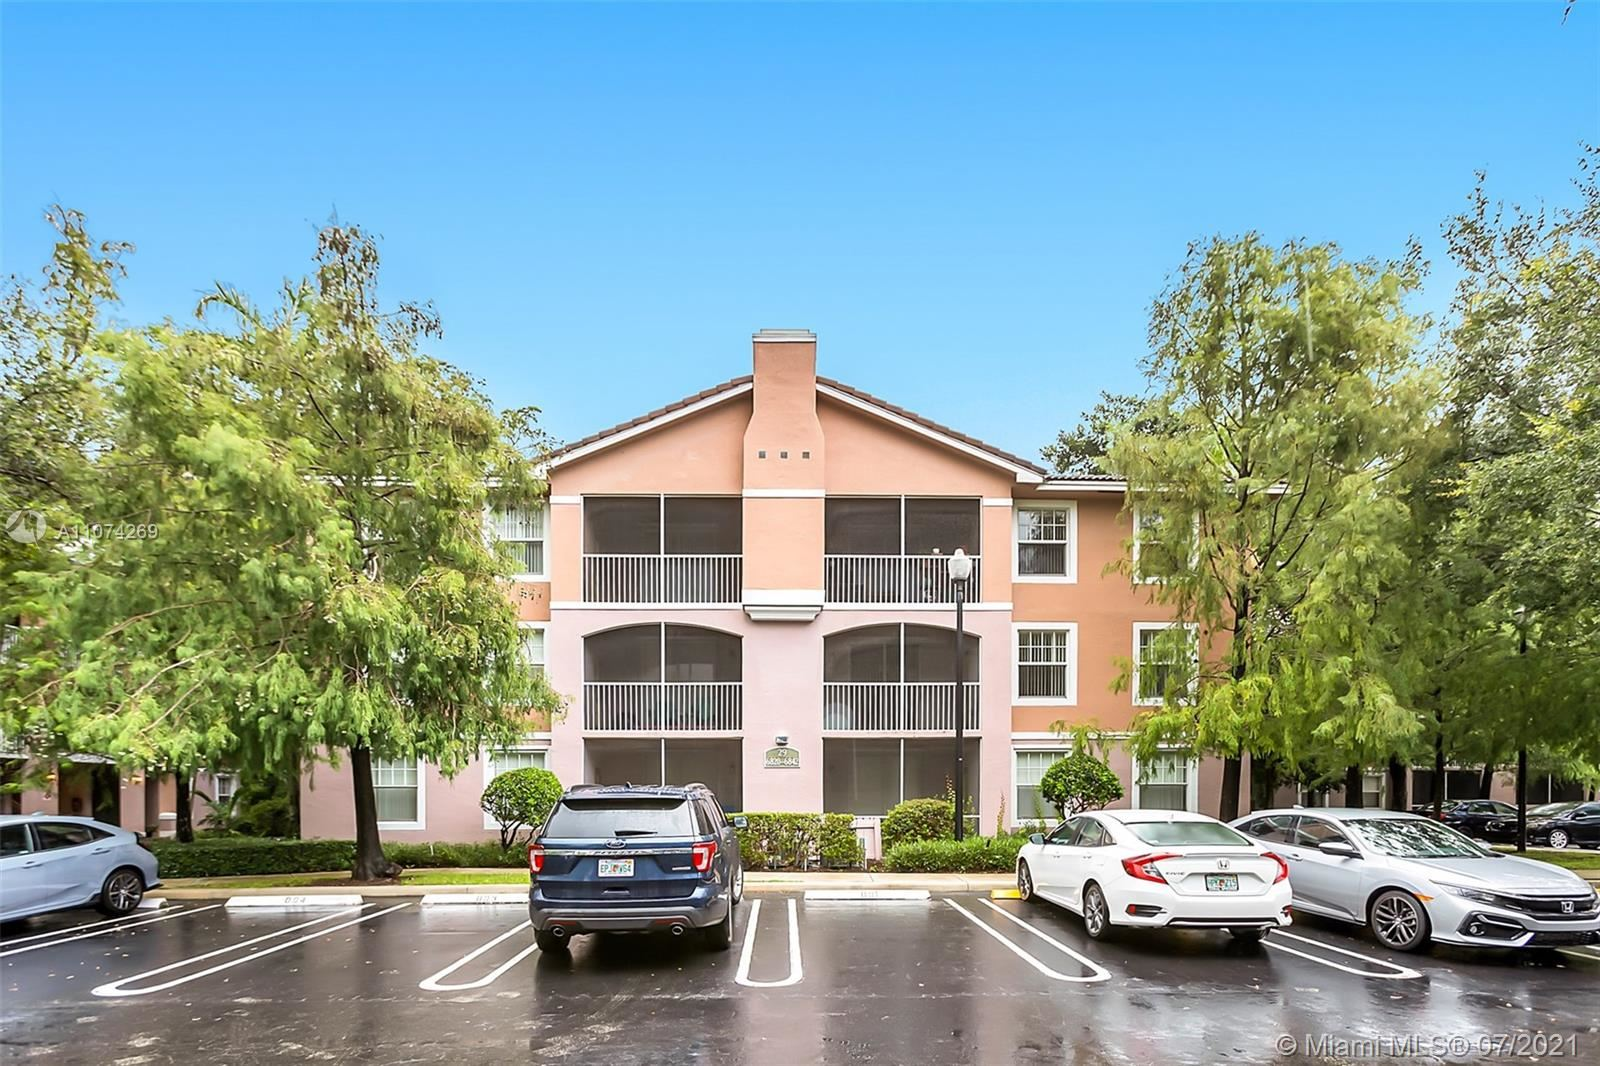 6824 W Sample Rd #6824, Coral Springs, FL 33067 - #: A11074269